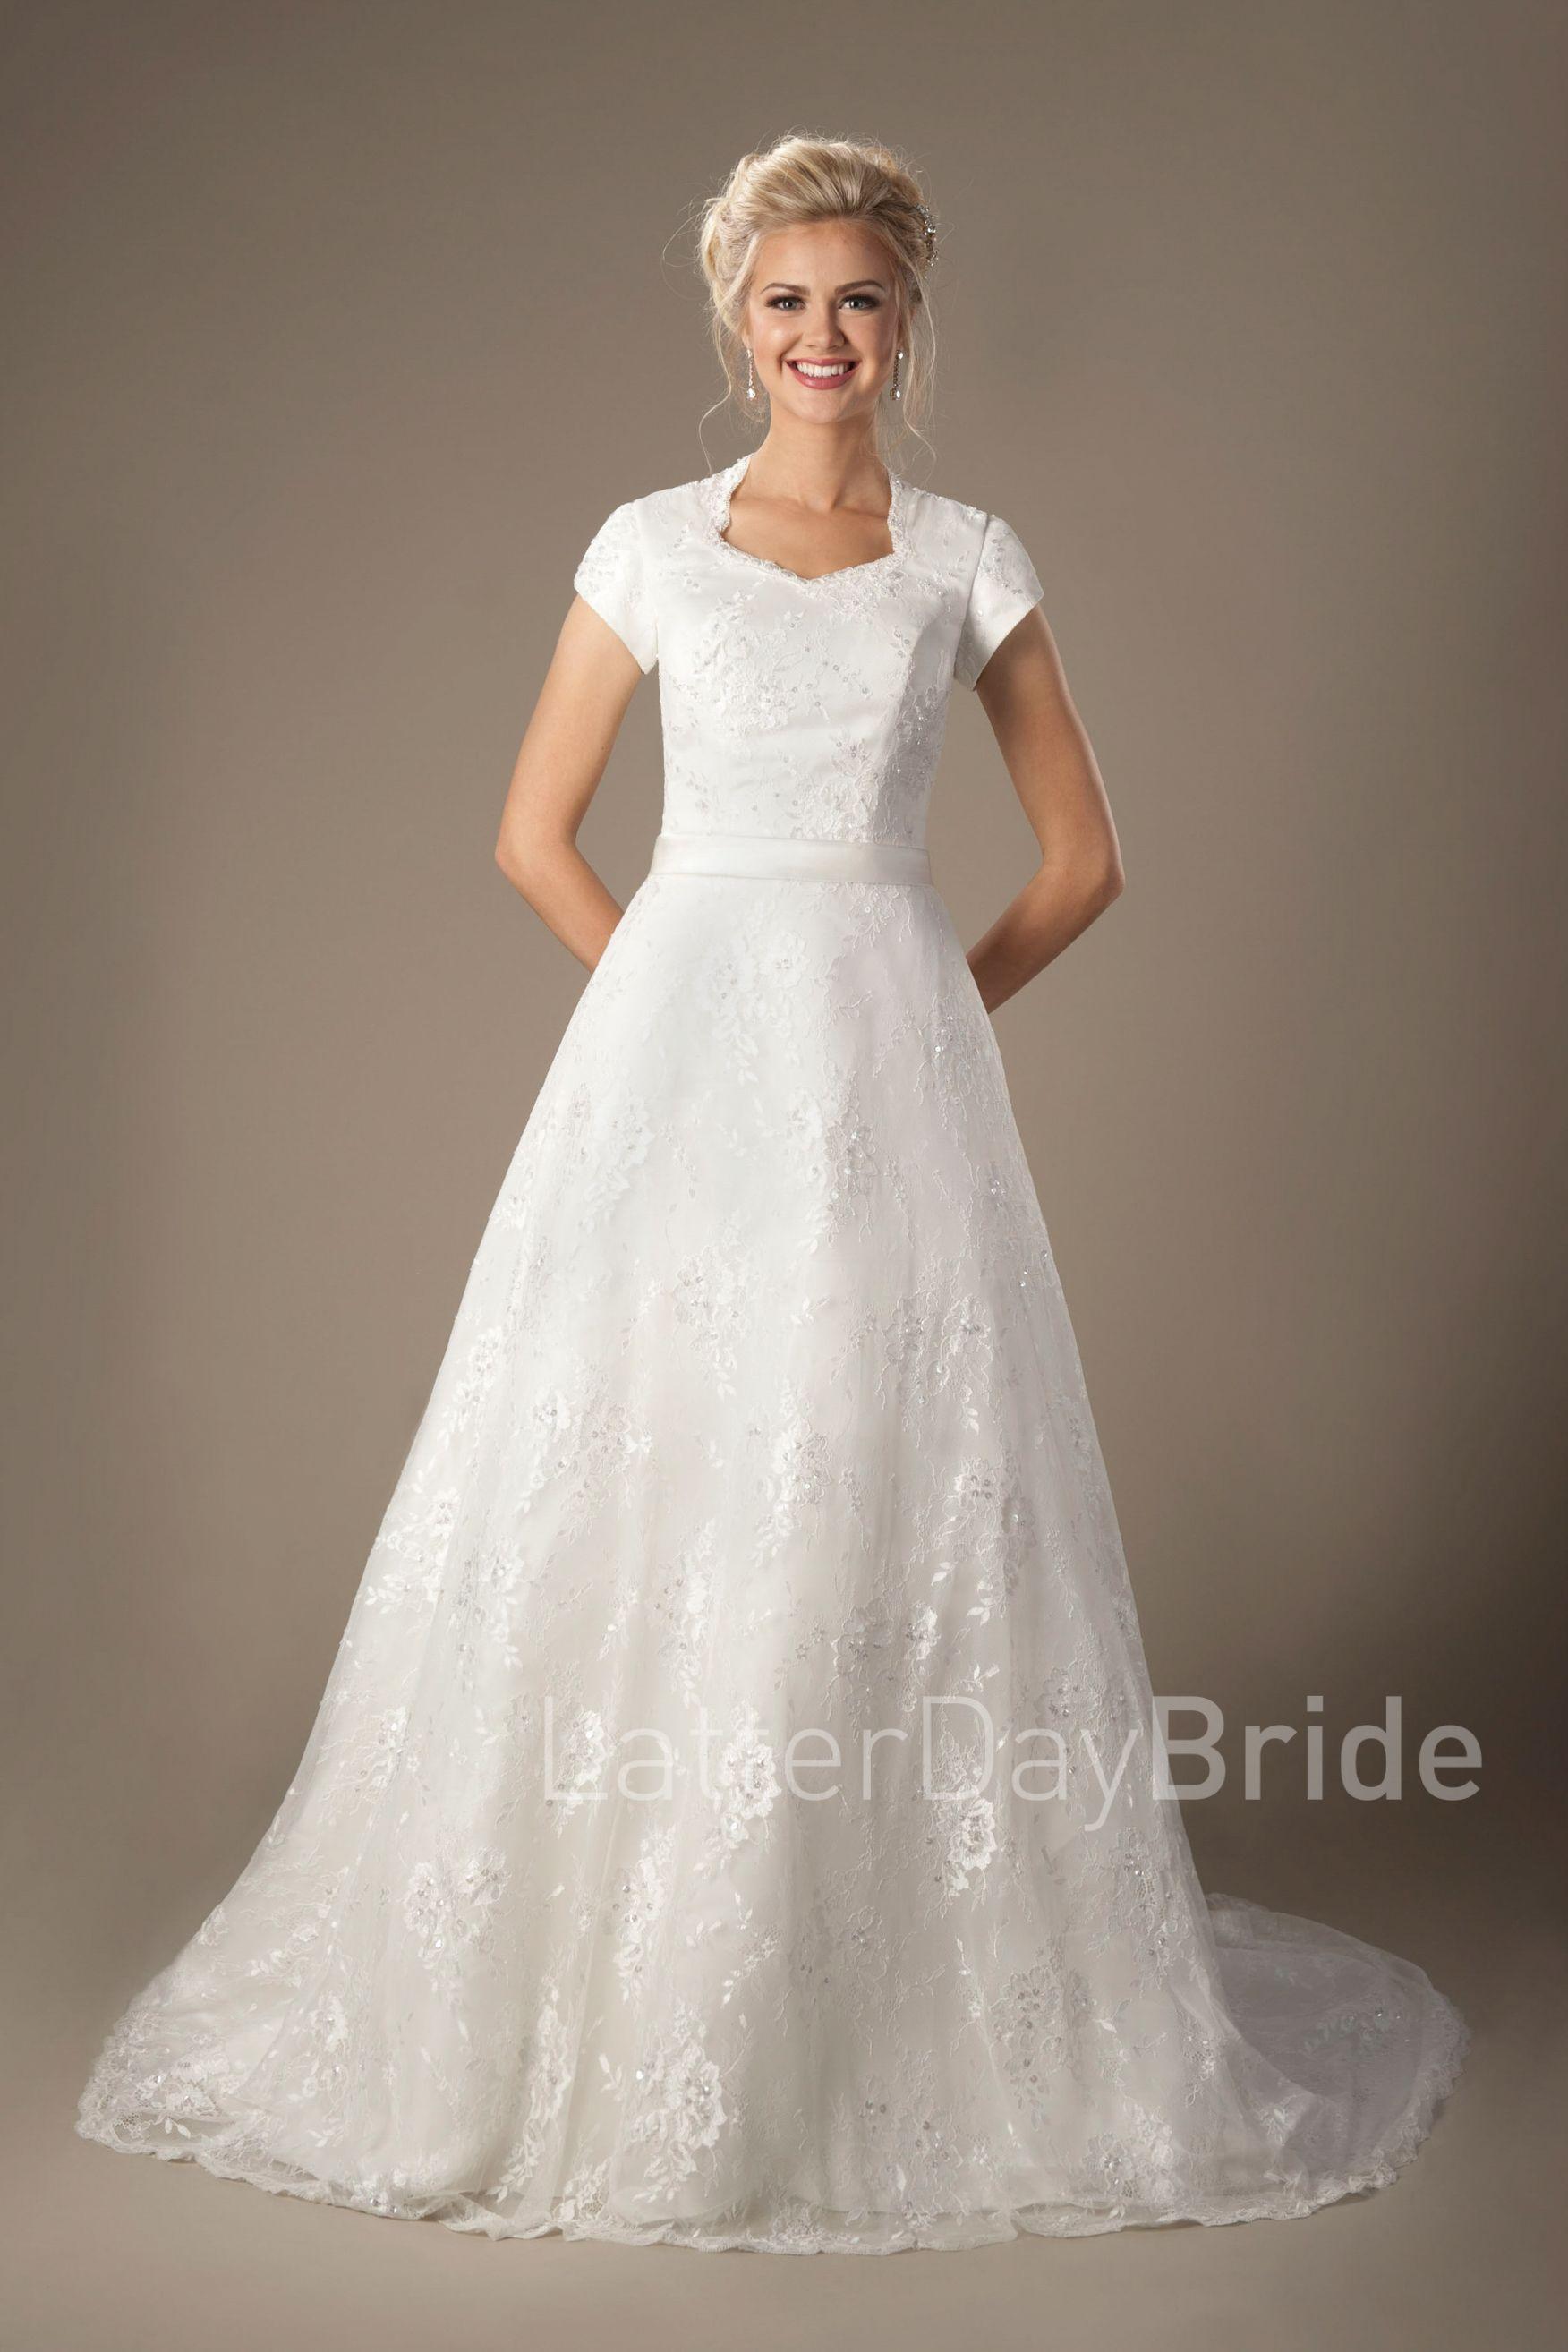 Henri | Modest Wedding Dress under $700 | LatterDayBride & Prom ...